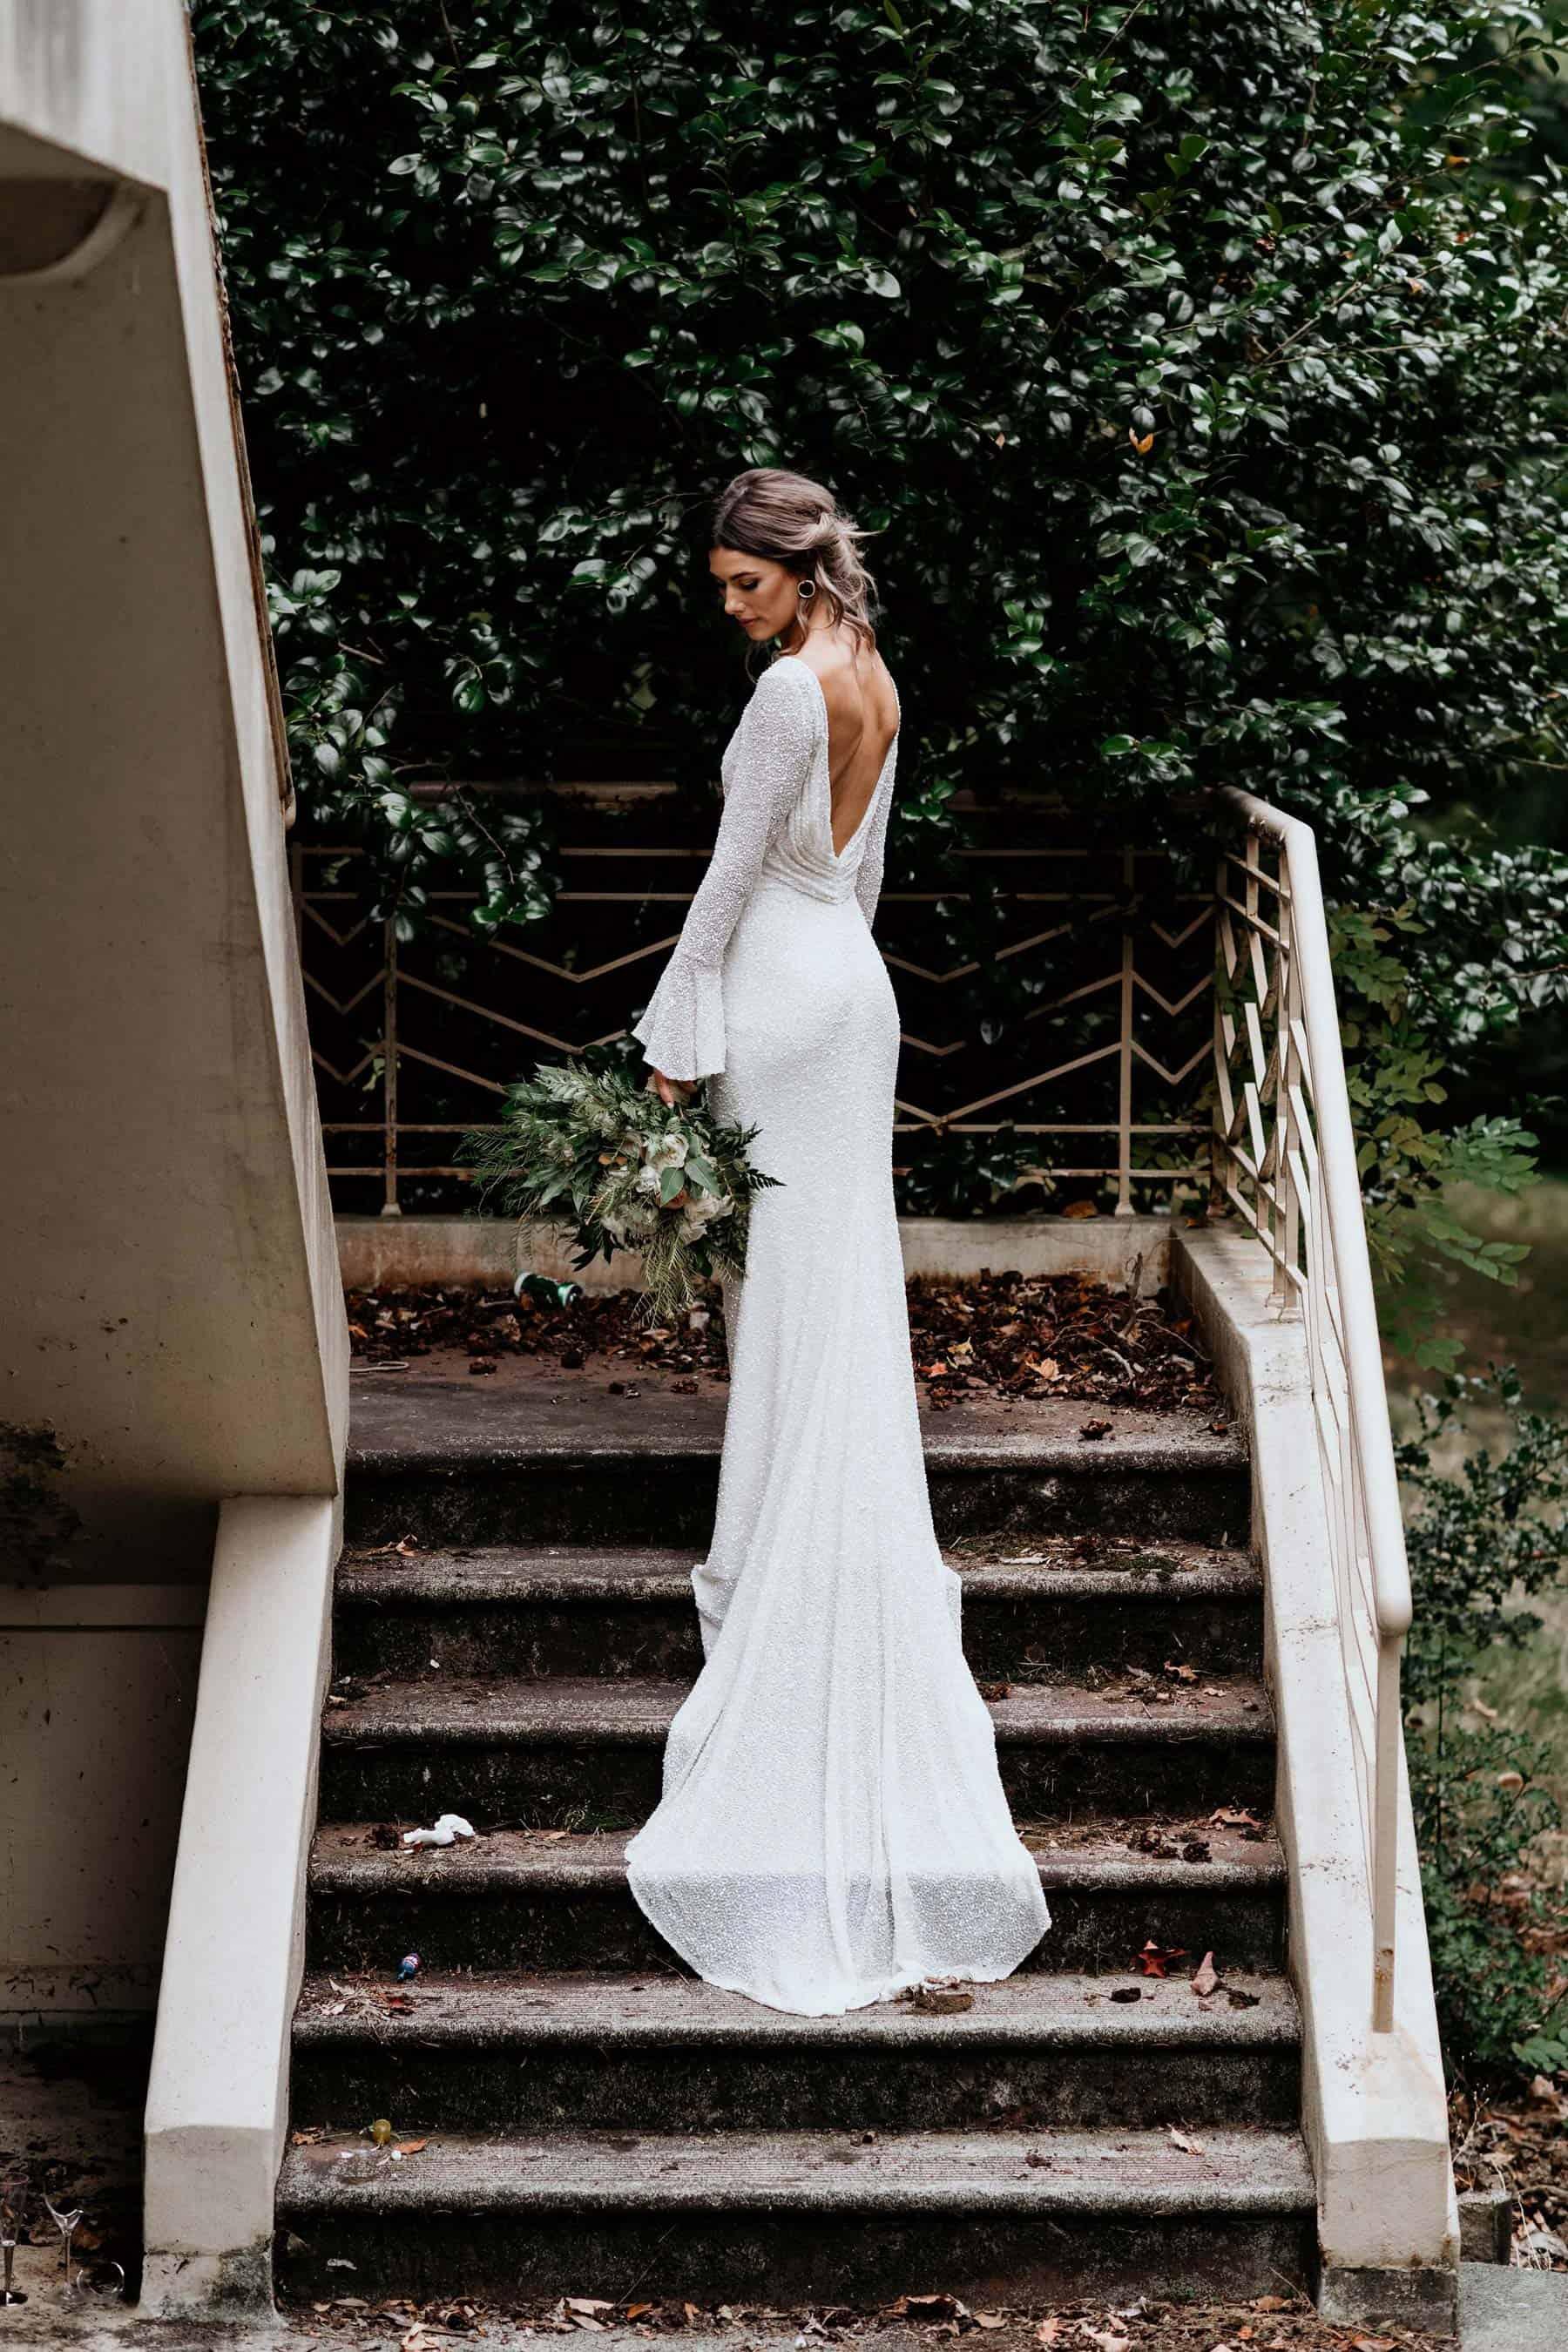 Best wedding dresses of 2019 -bell-sleeve sequin wedding dress